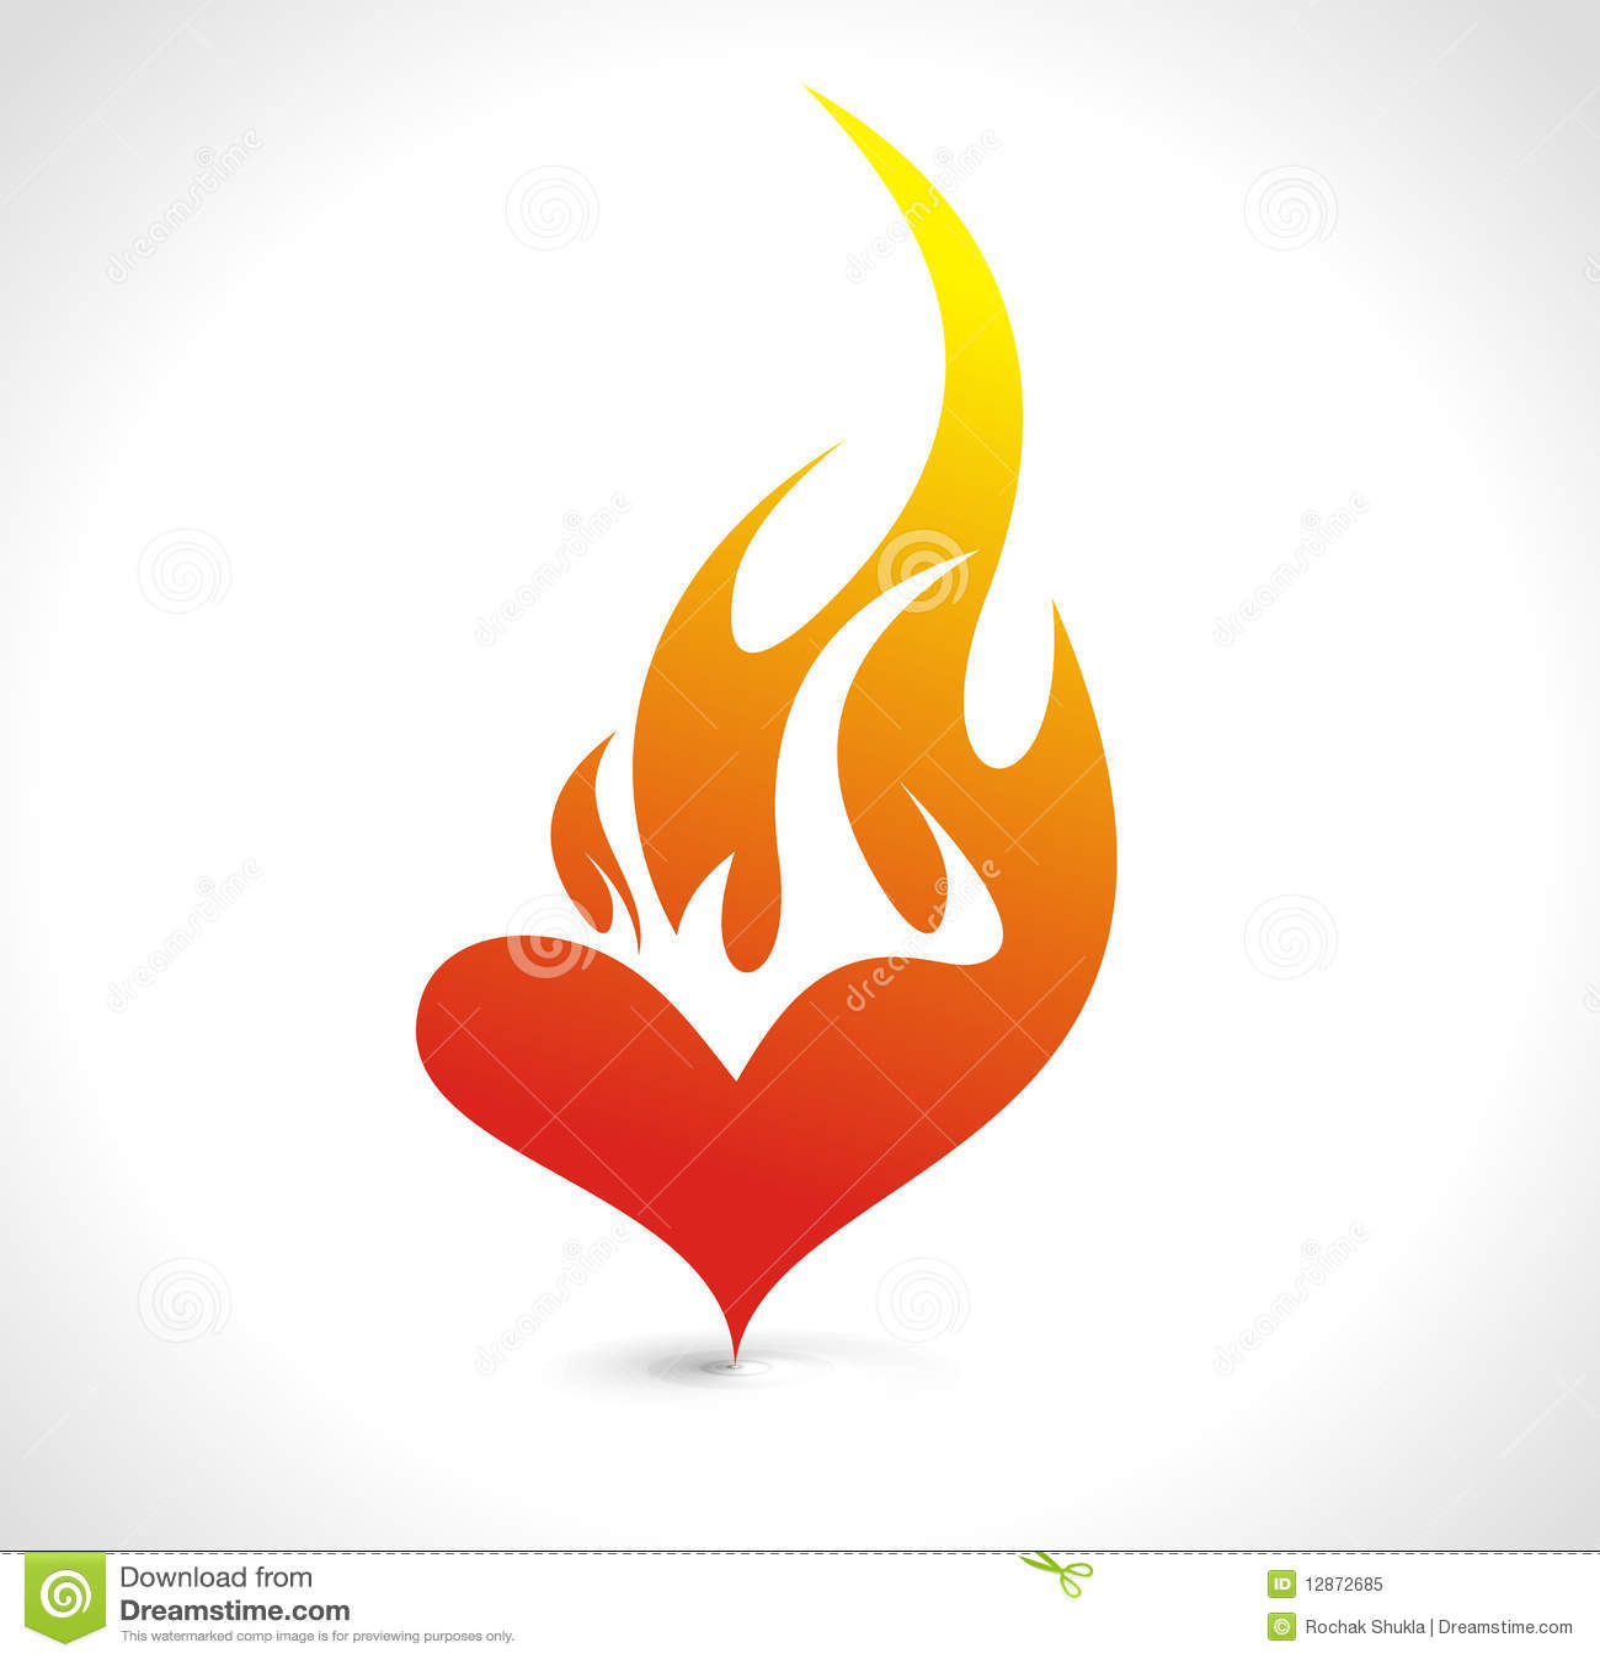 Fire heart stock vector. Illustration of blazing, icon ...